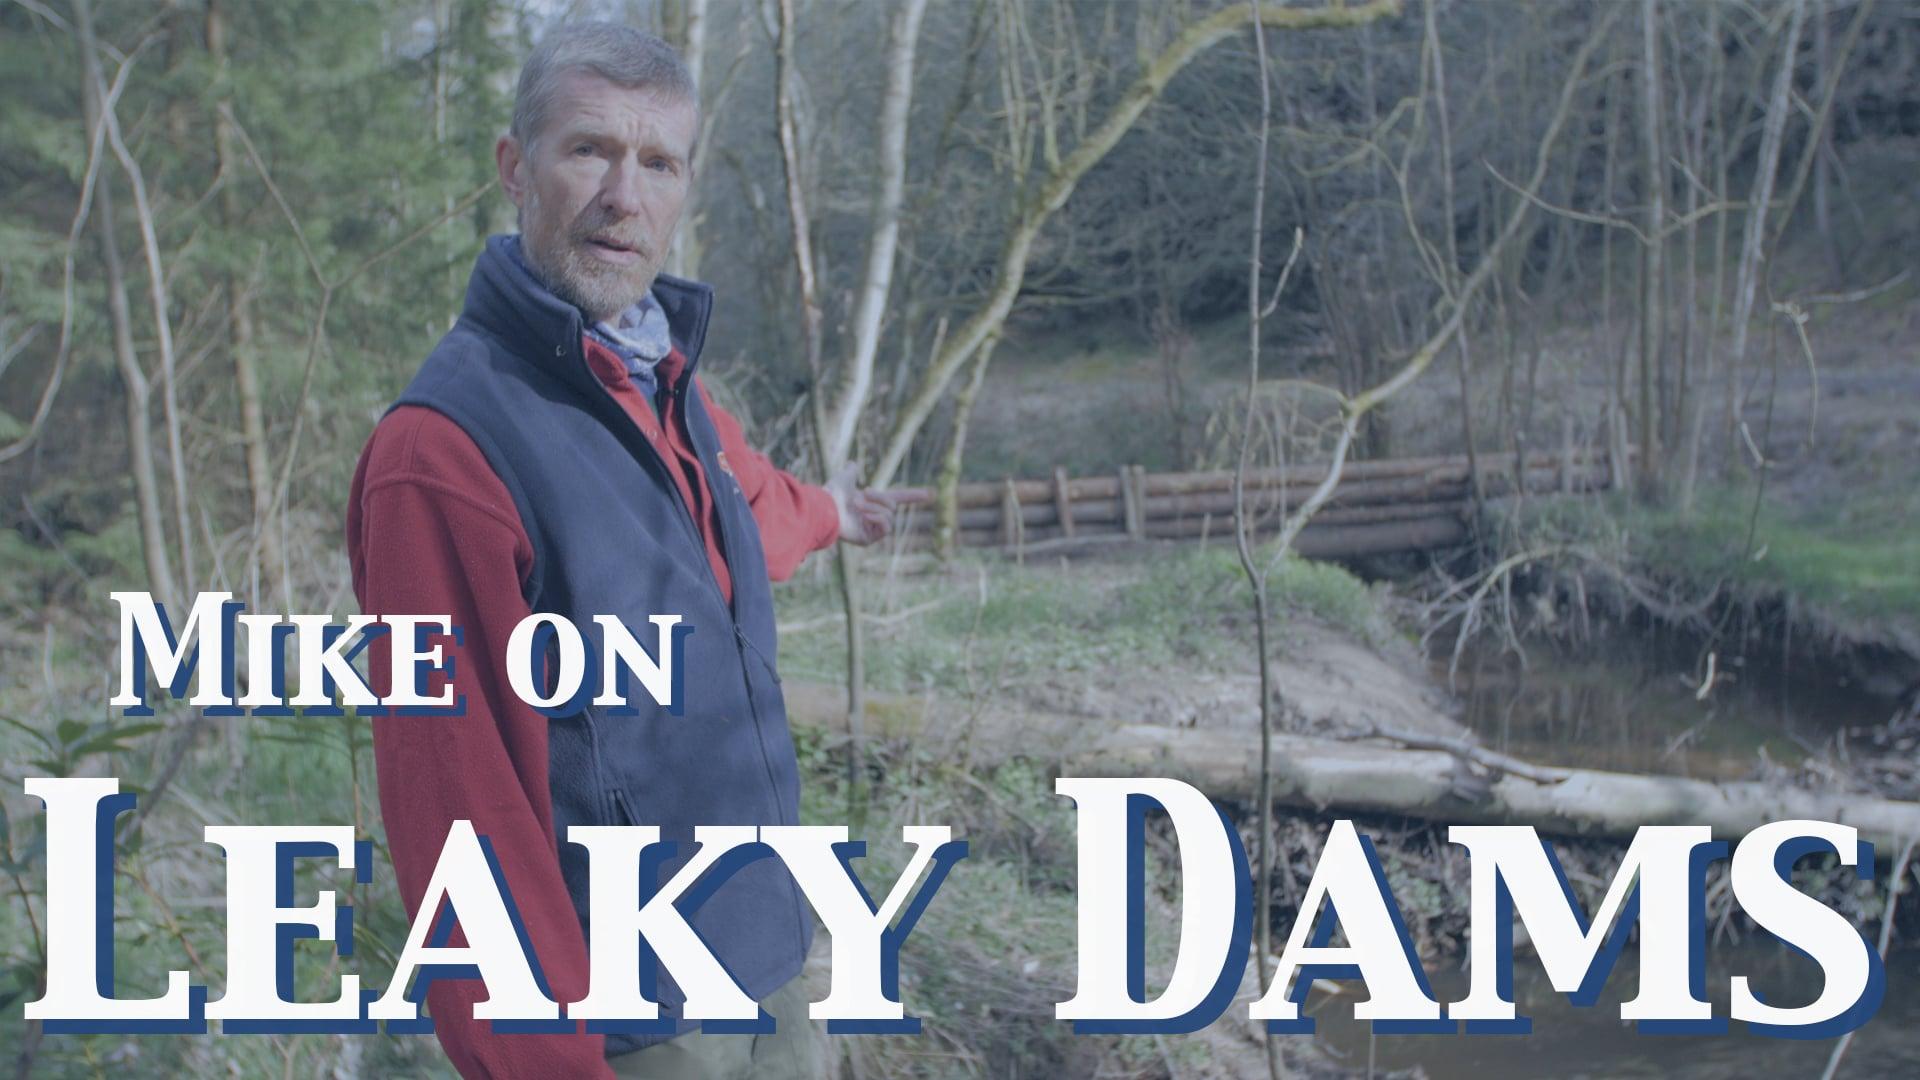 Mike on Leaky Dams